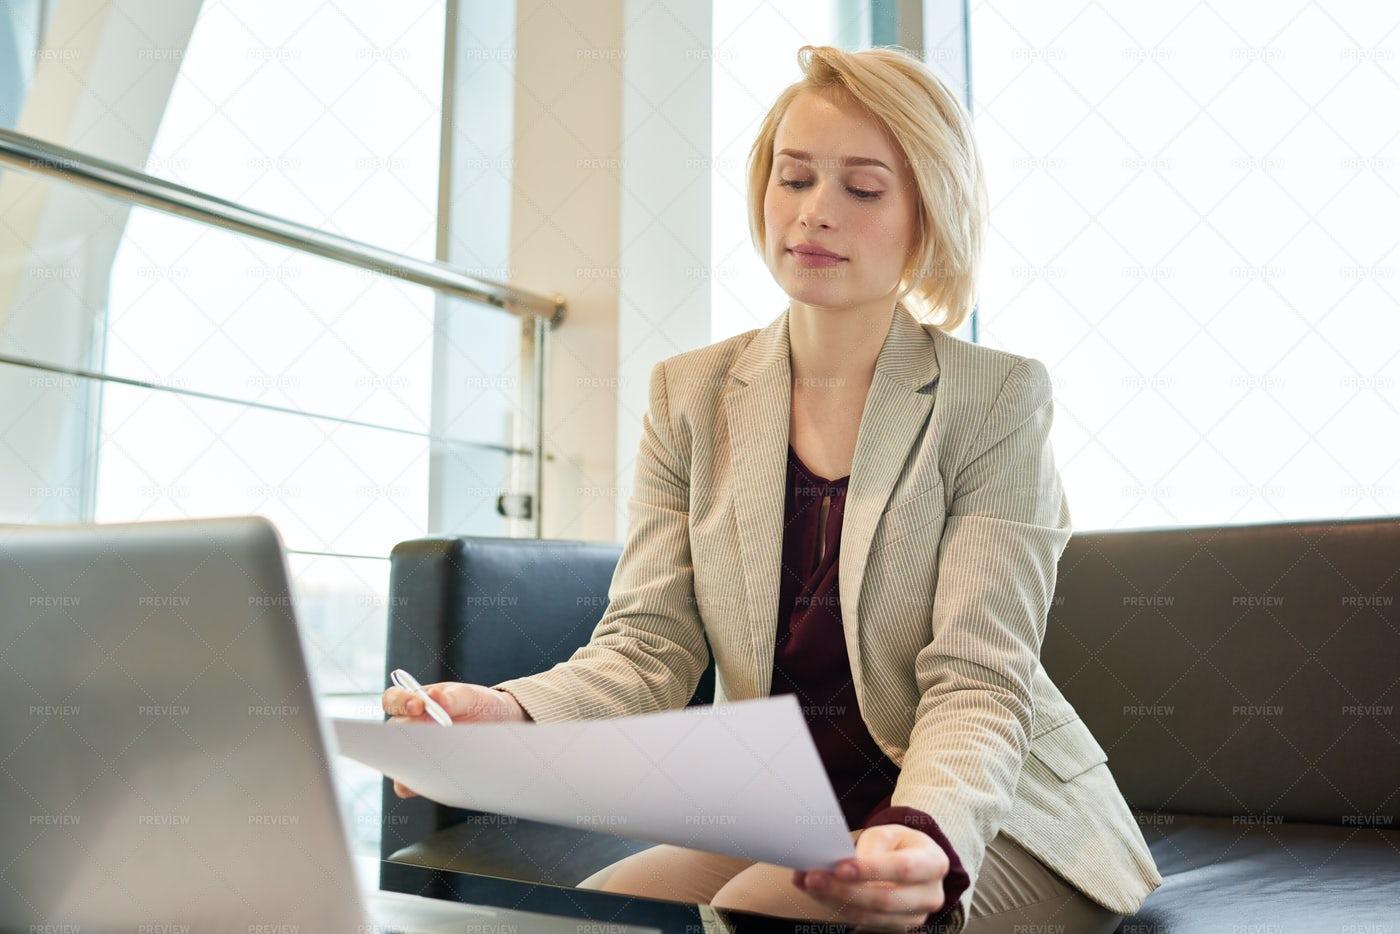 Blond-haired Entrepreneur Focused...: Stock Photos